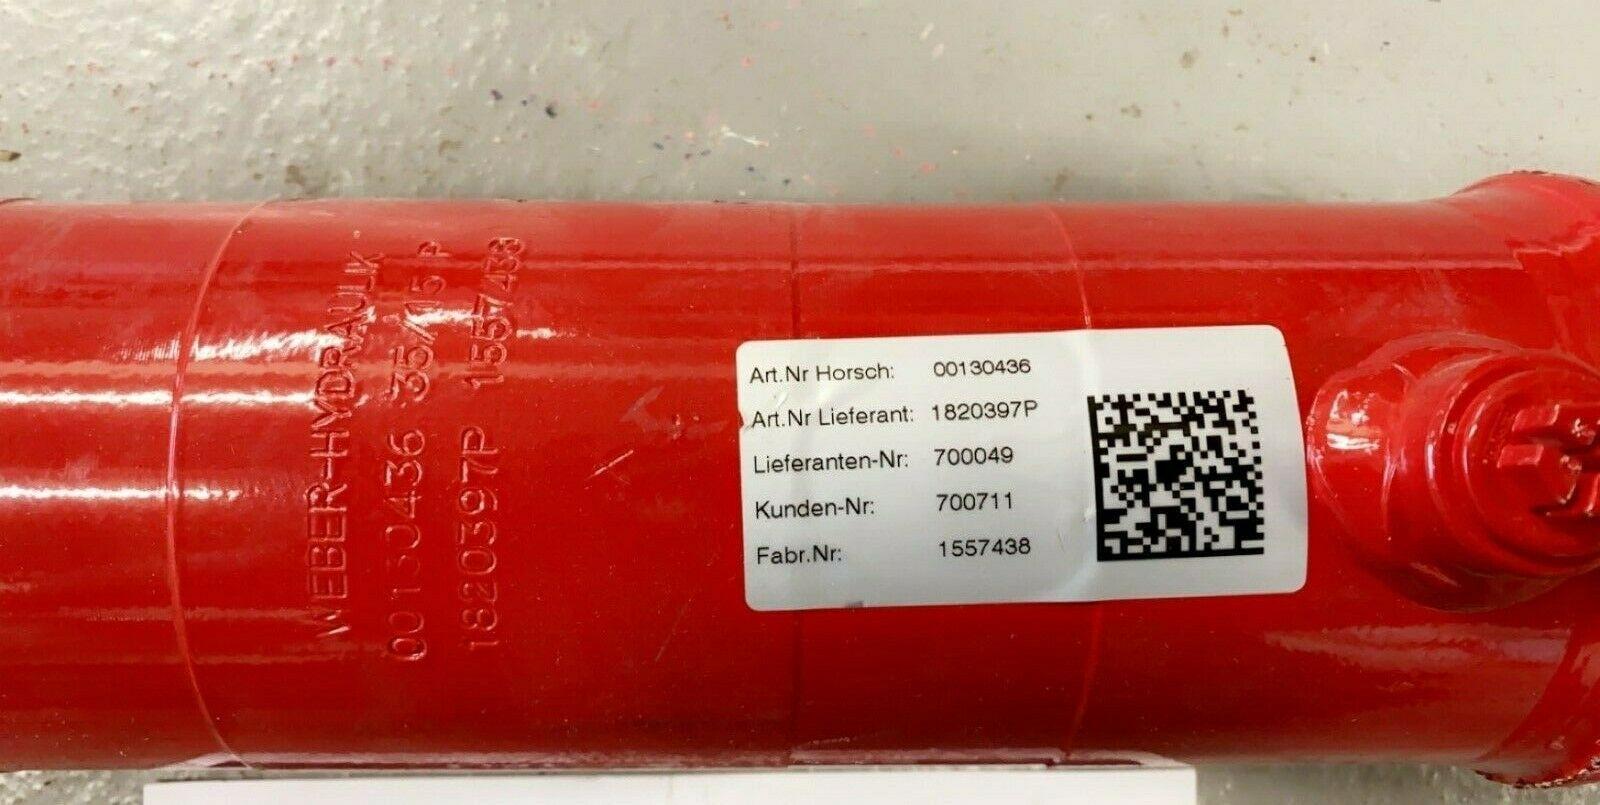 HORSCH Hydraulic Cylinder - 00130436